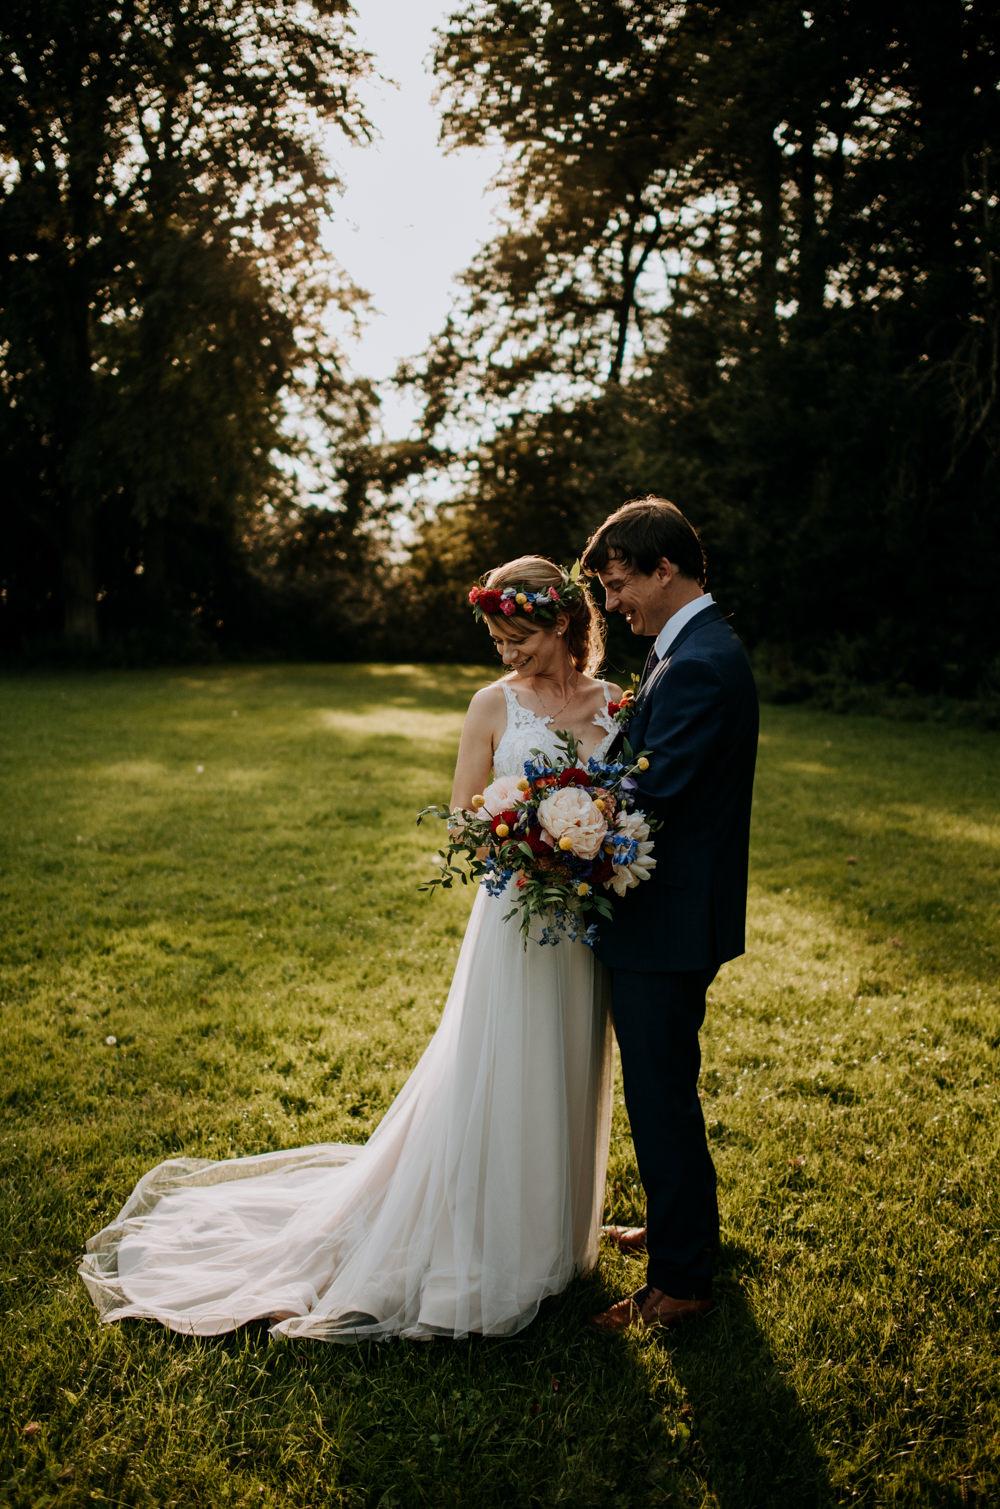 Dress Gown Bride Bridal Tulle Train Straps Cabourne Parva Wedding Kazooieloki Photography